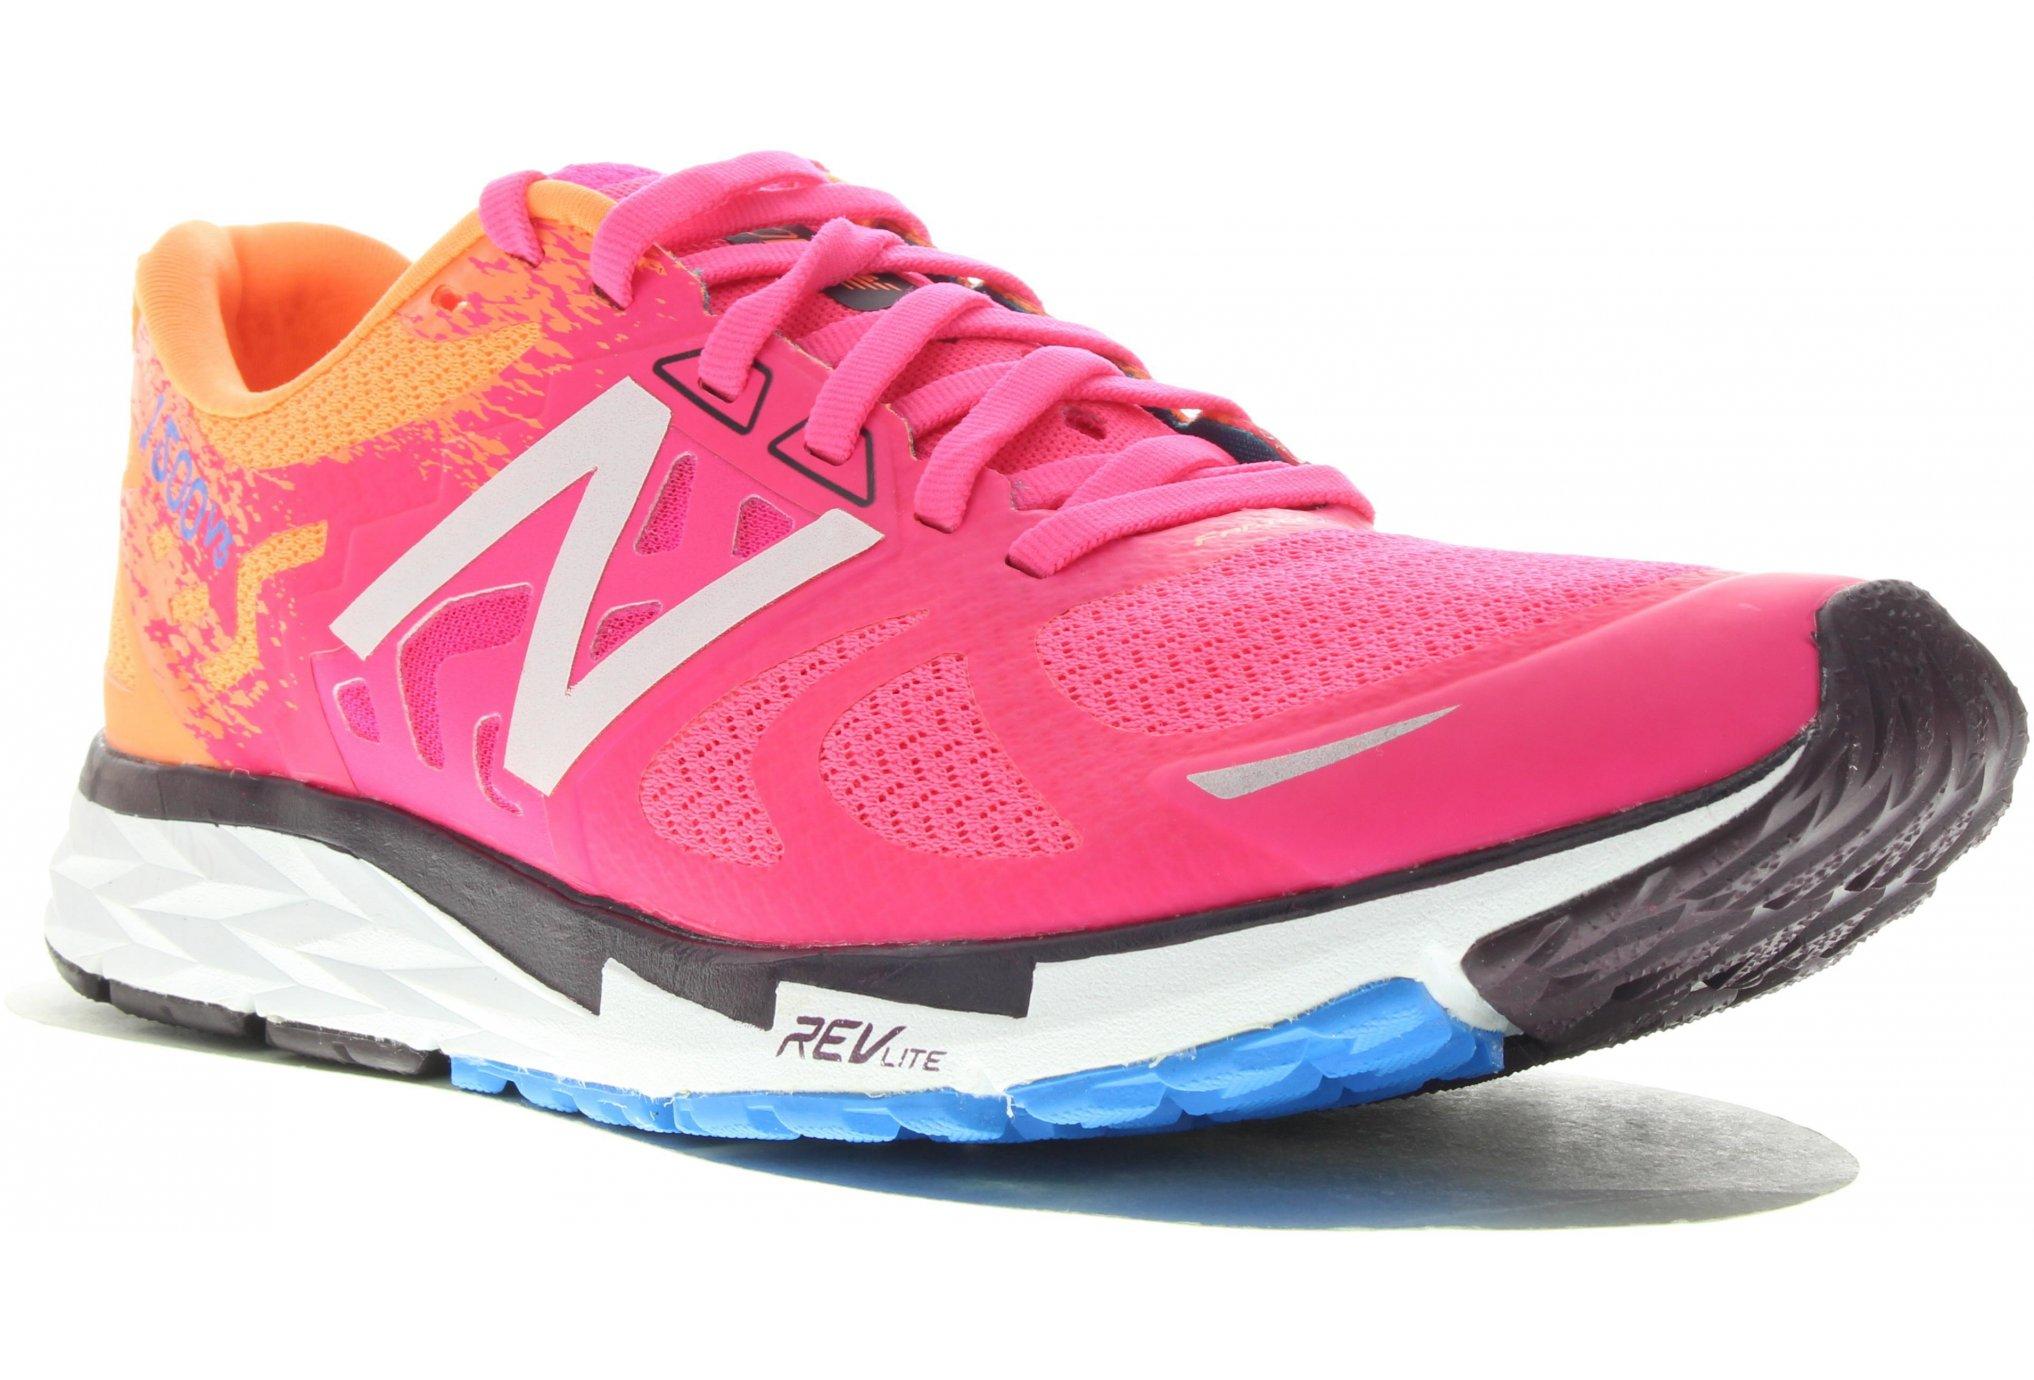 New balance w 1500 v3 b chaussures running femme